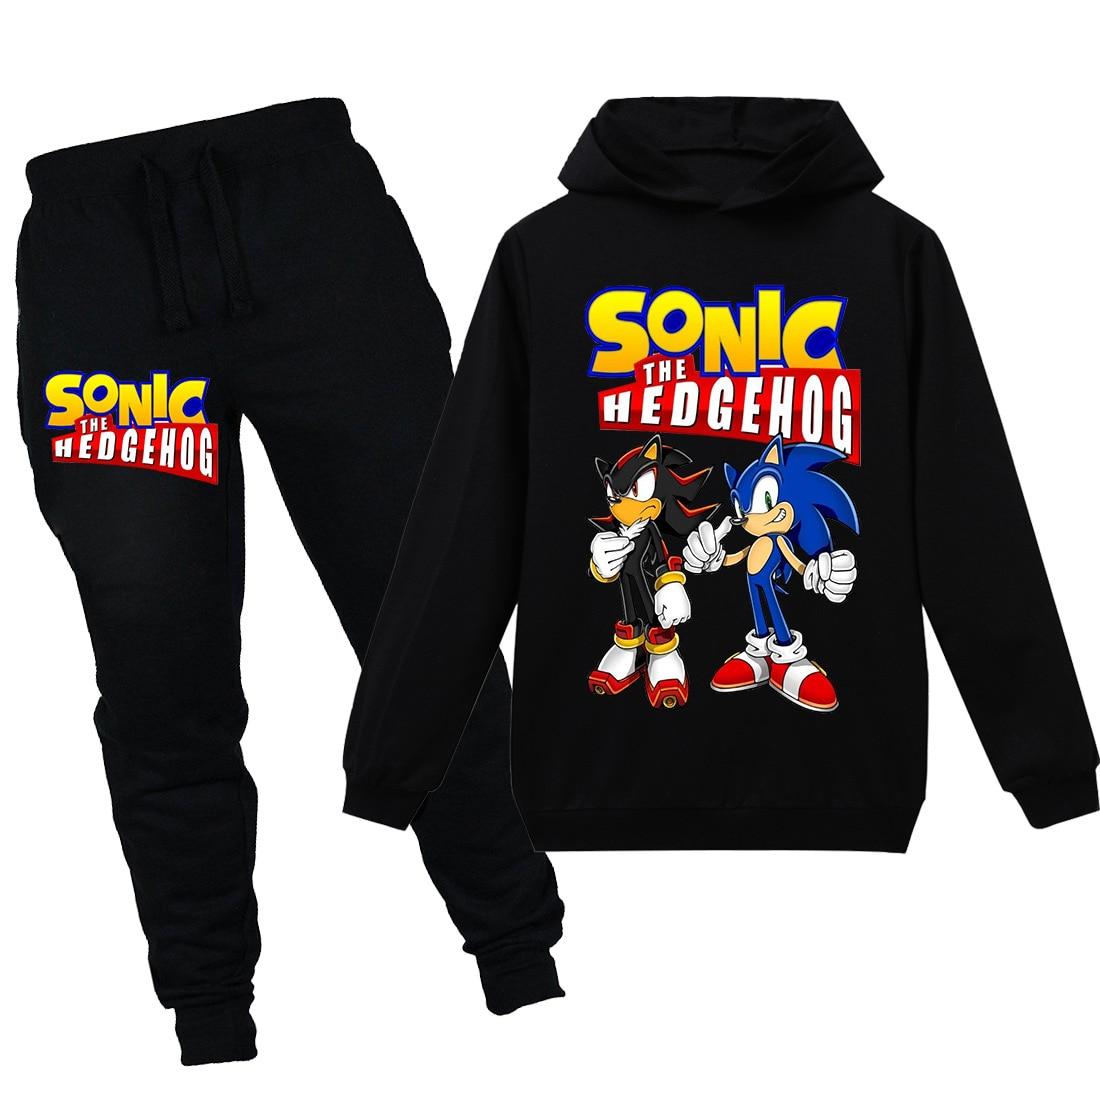 Child Tracksuit Autumn Boy Clothing Sets Children Boys Girls Sonic The Hedgehog Clothes Kids Hooded T-shirt Pants 2 Pcs Suits